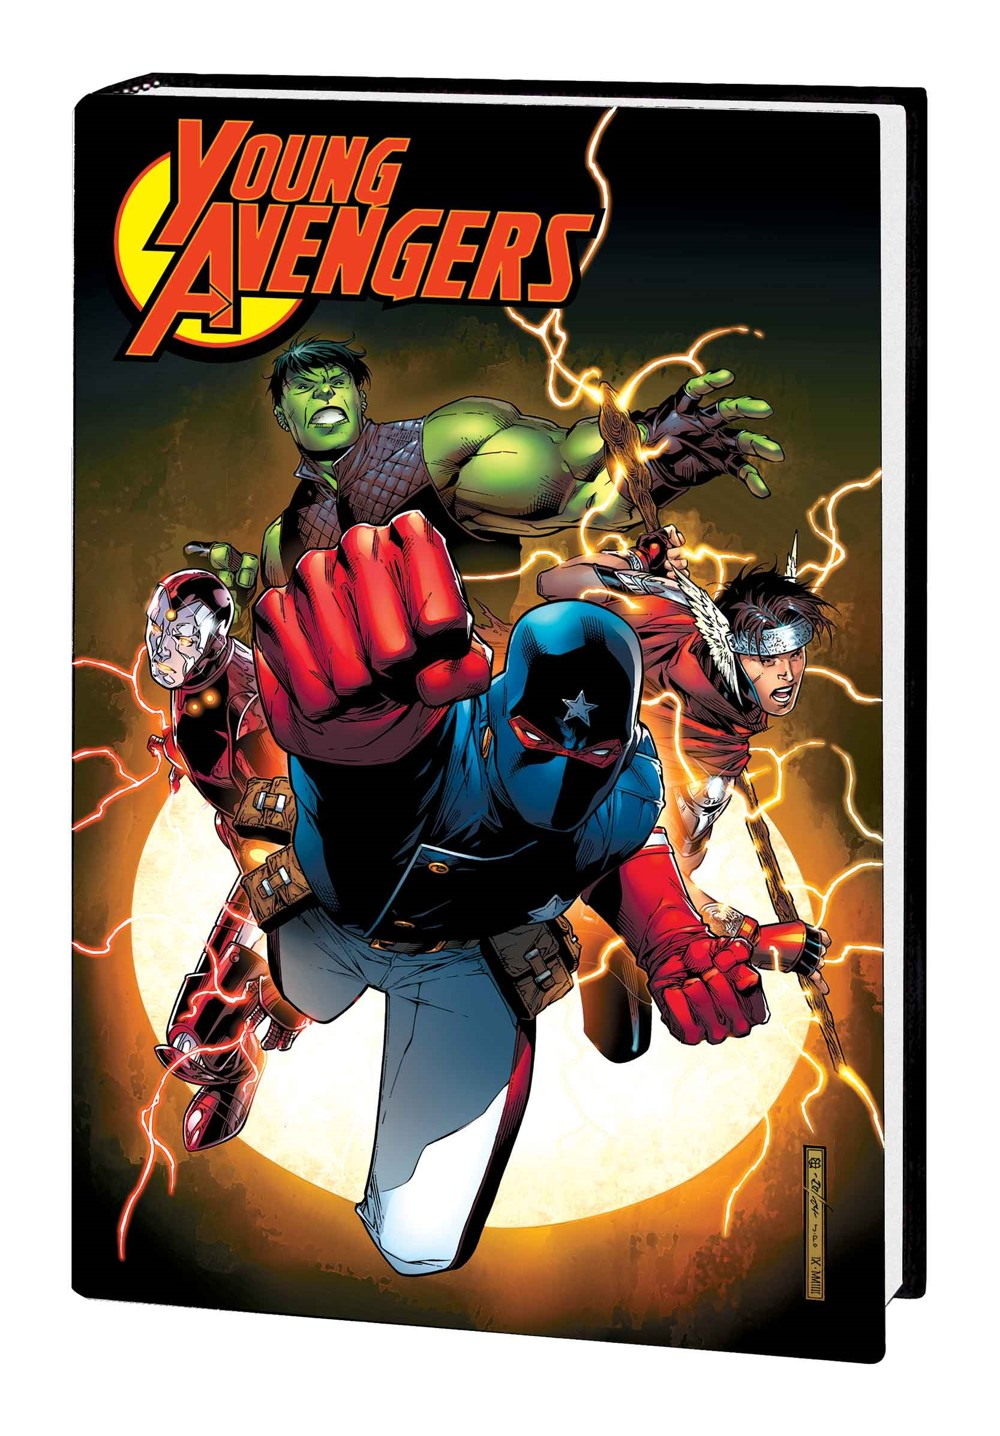 YNGAVNHCOMNIHC_cover Marvel Comics October 2021 Solicitations